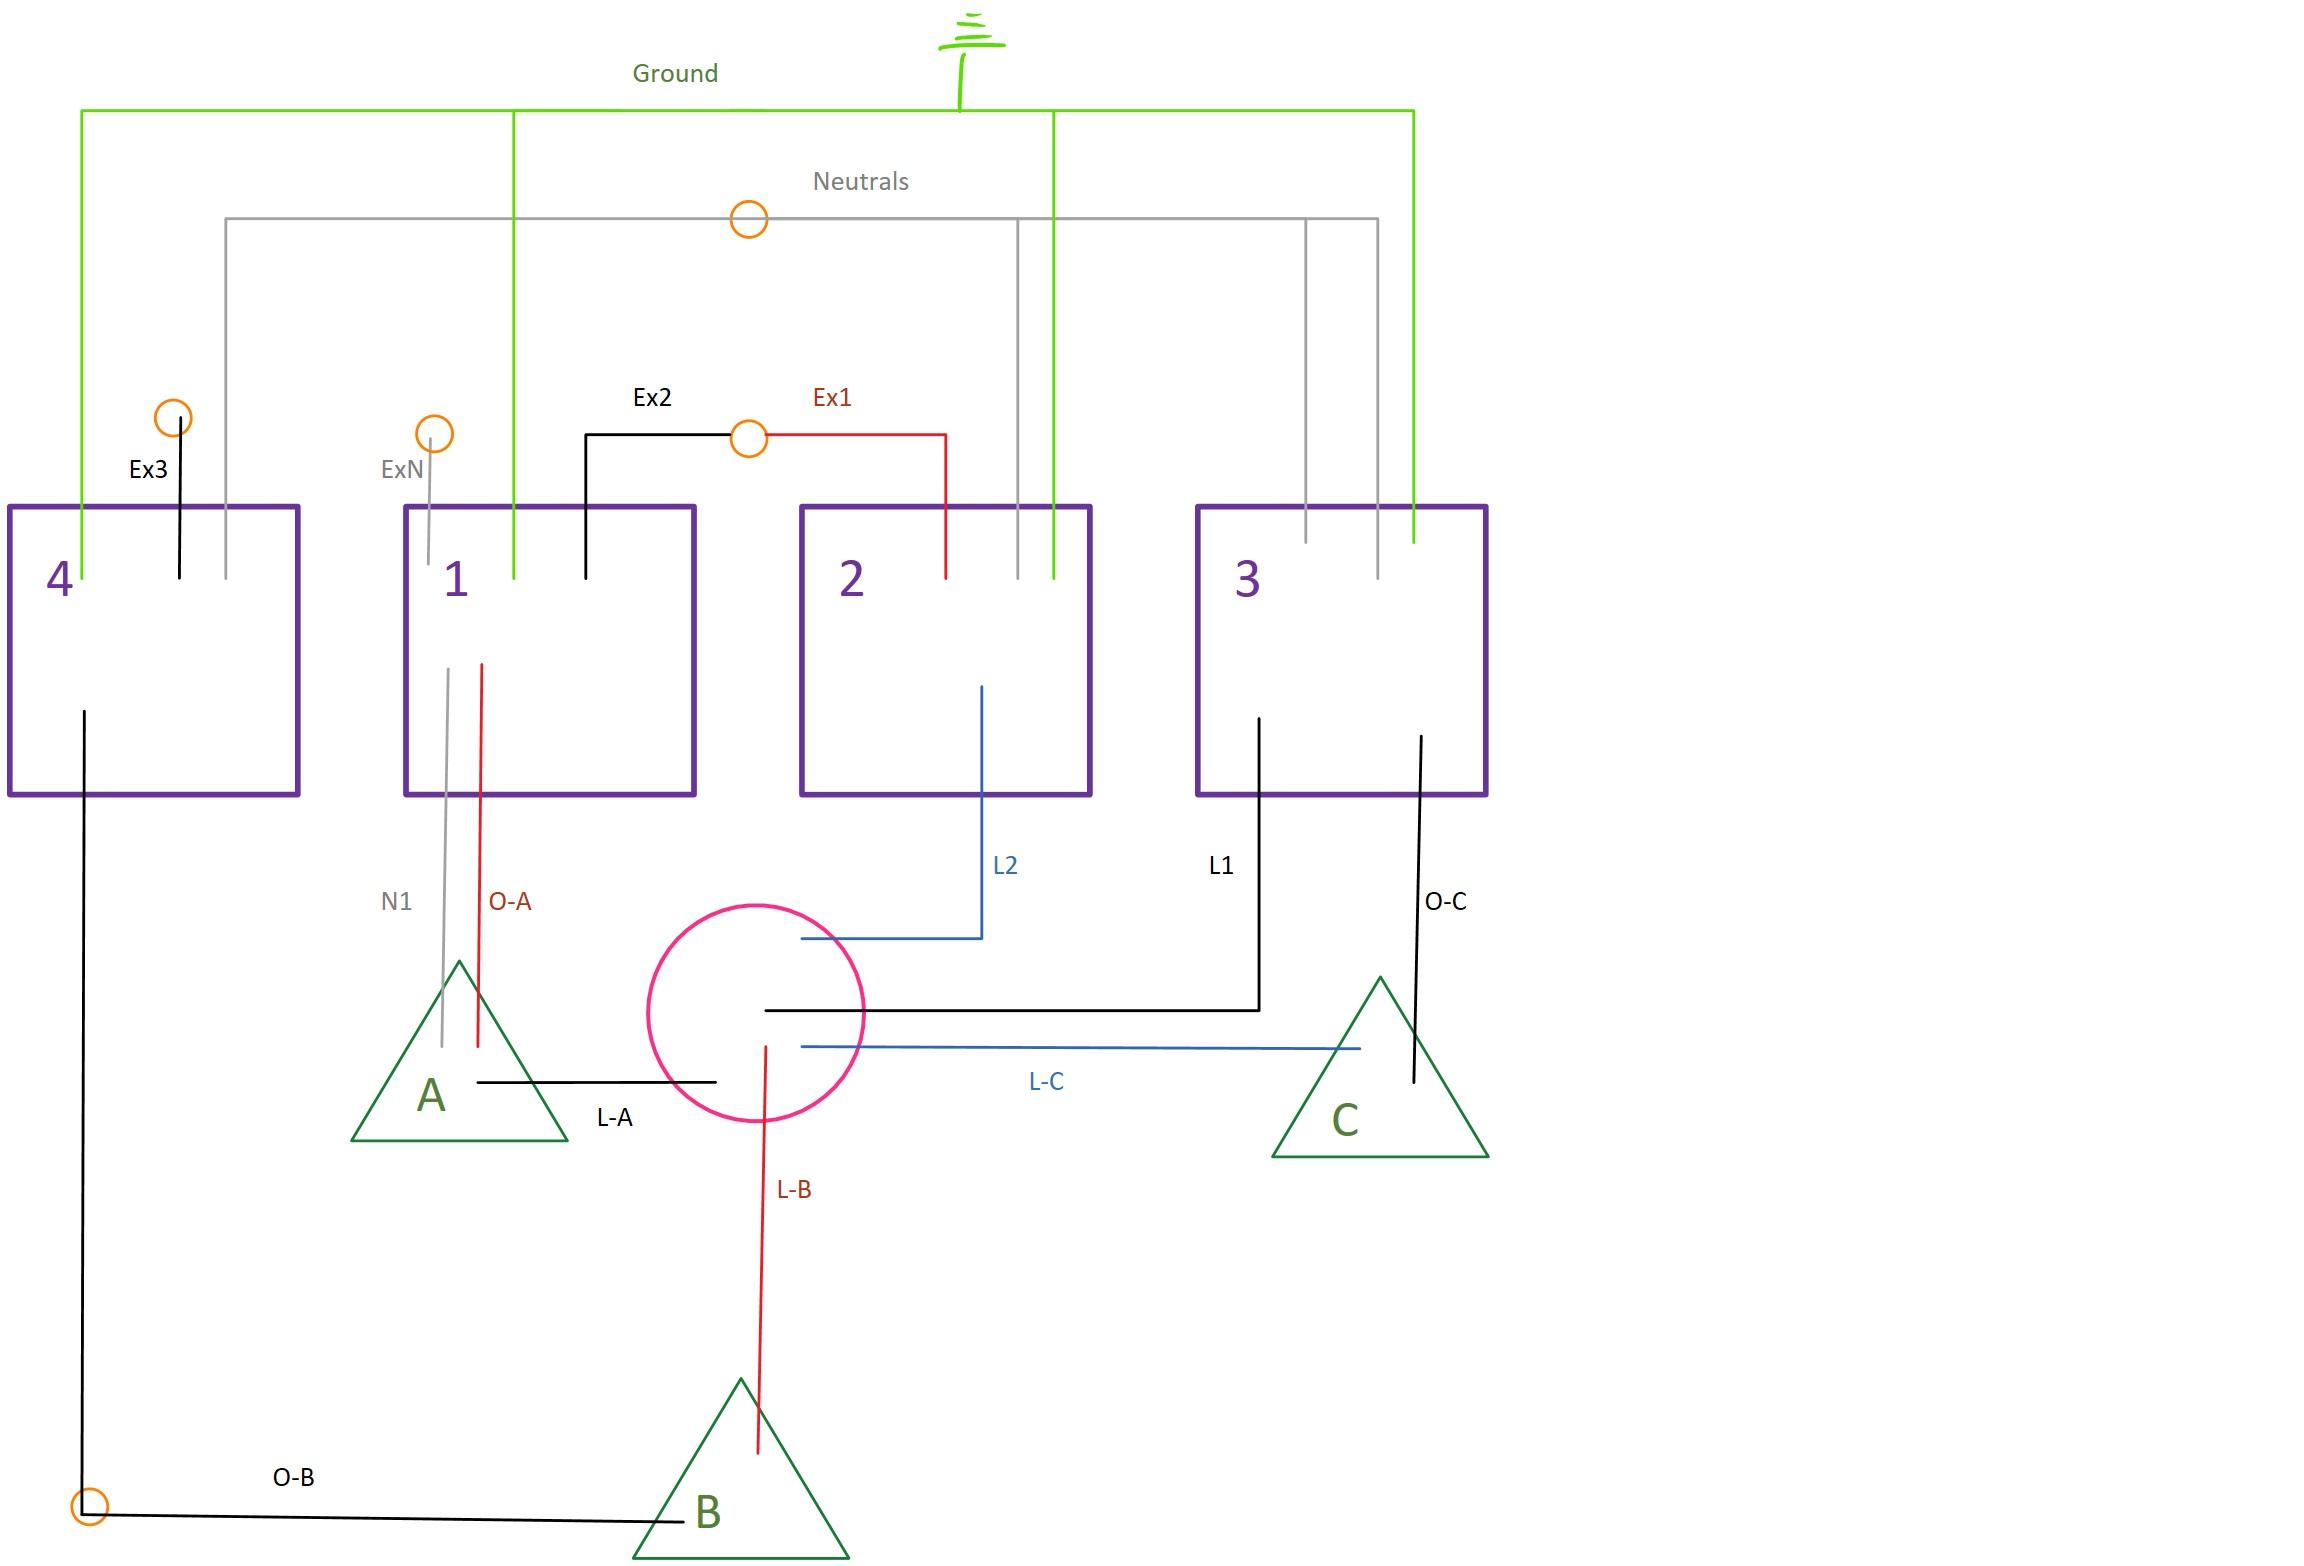 gang box wiring diagram wiring diagrams3 gang schematic wiring diagram 2 gang schematic wiring diagram 3 gang switch wiring 3 gang